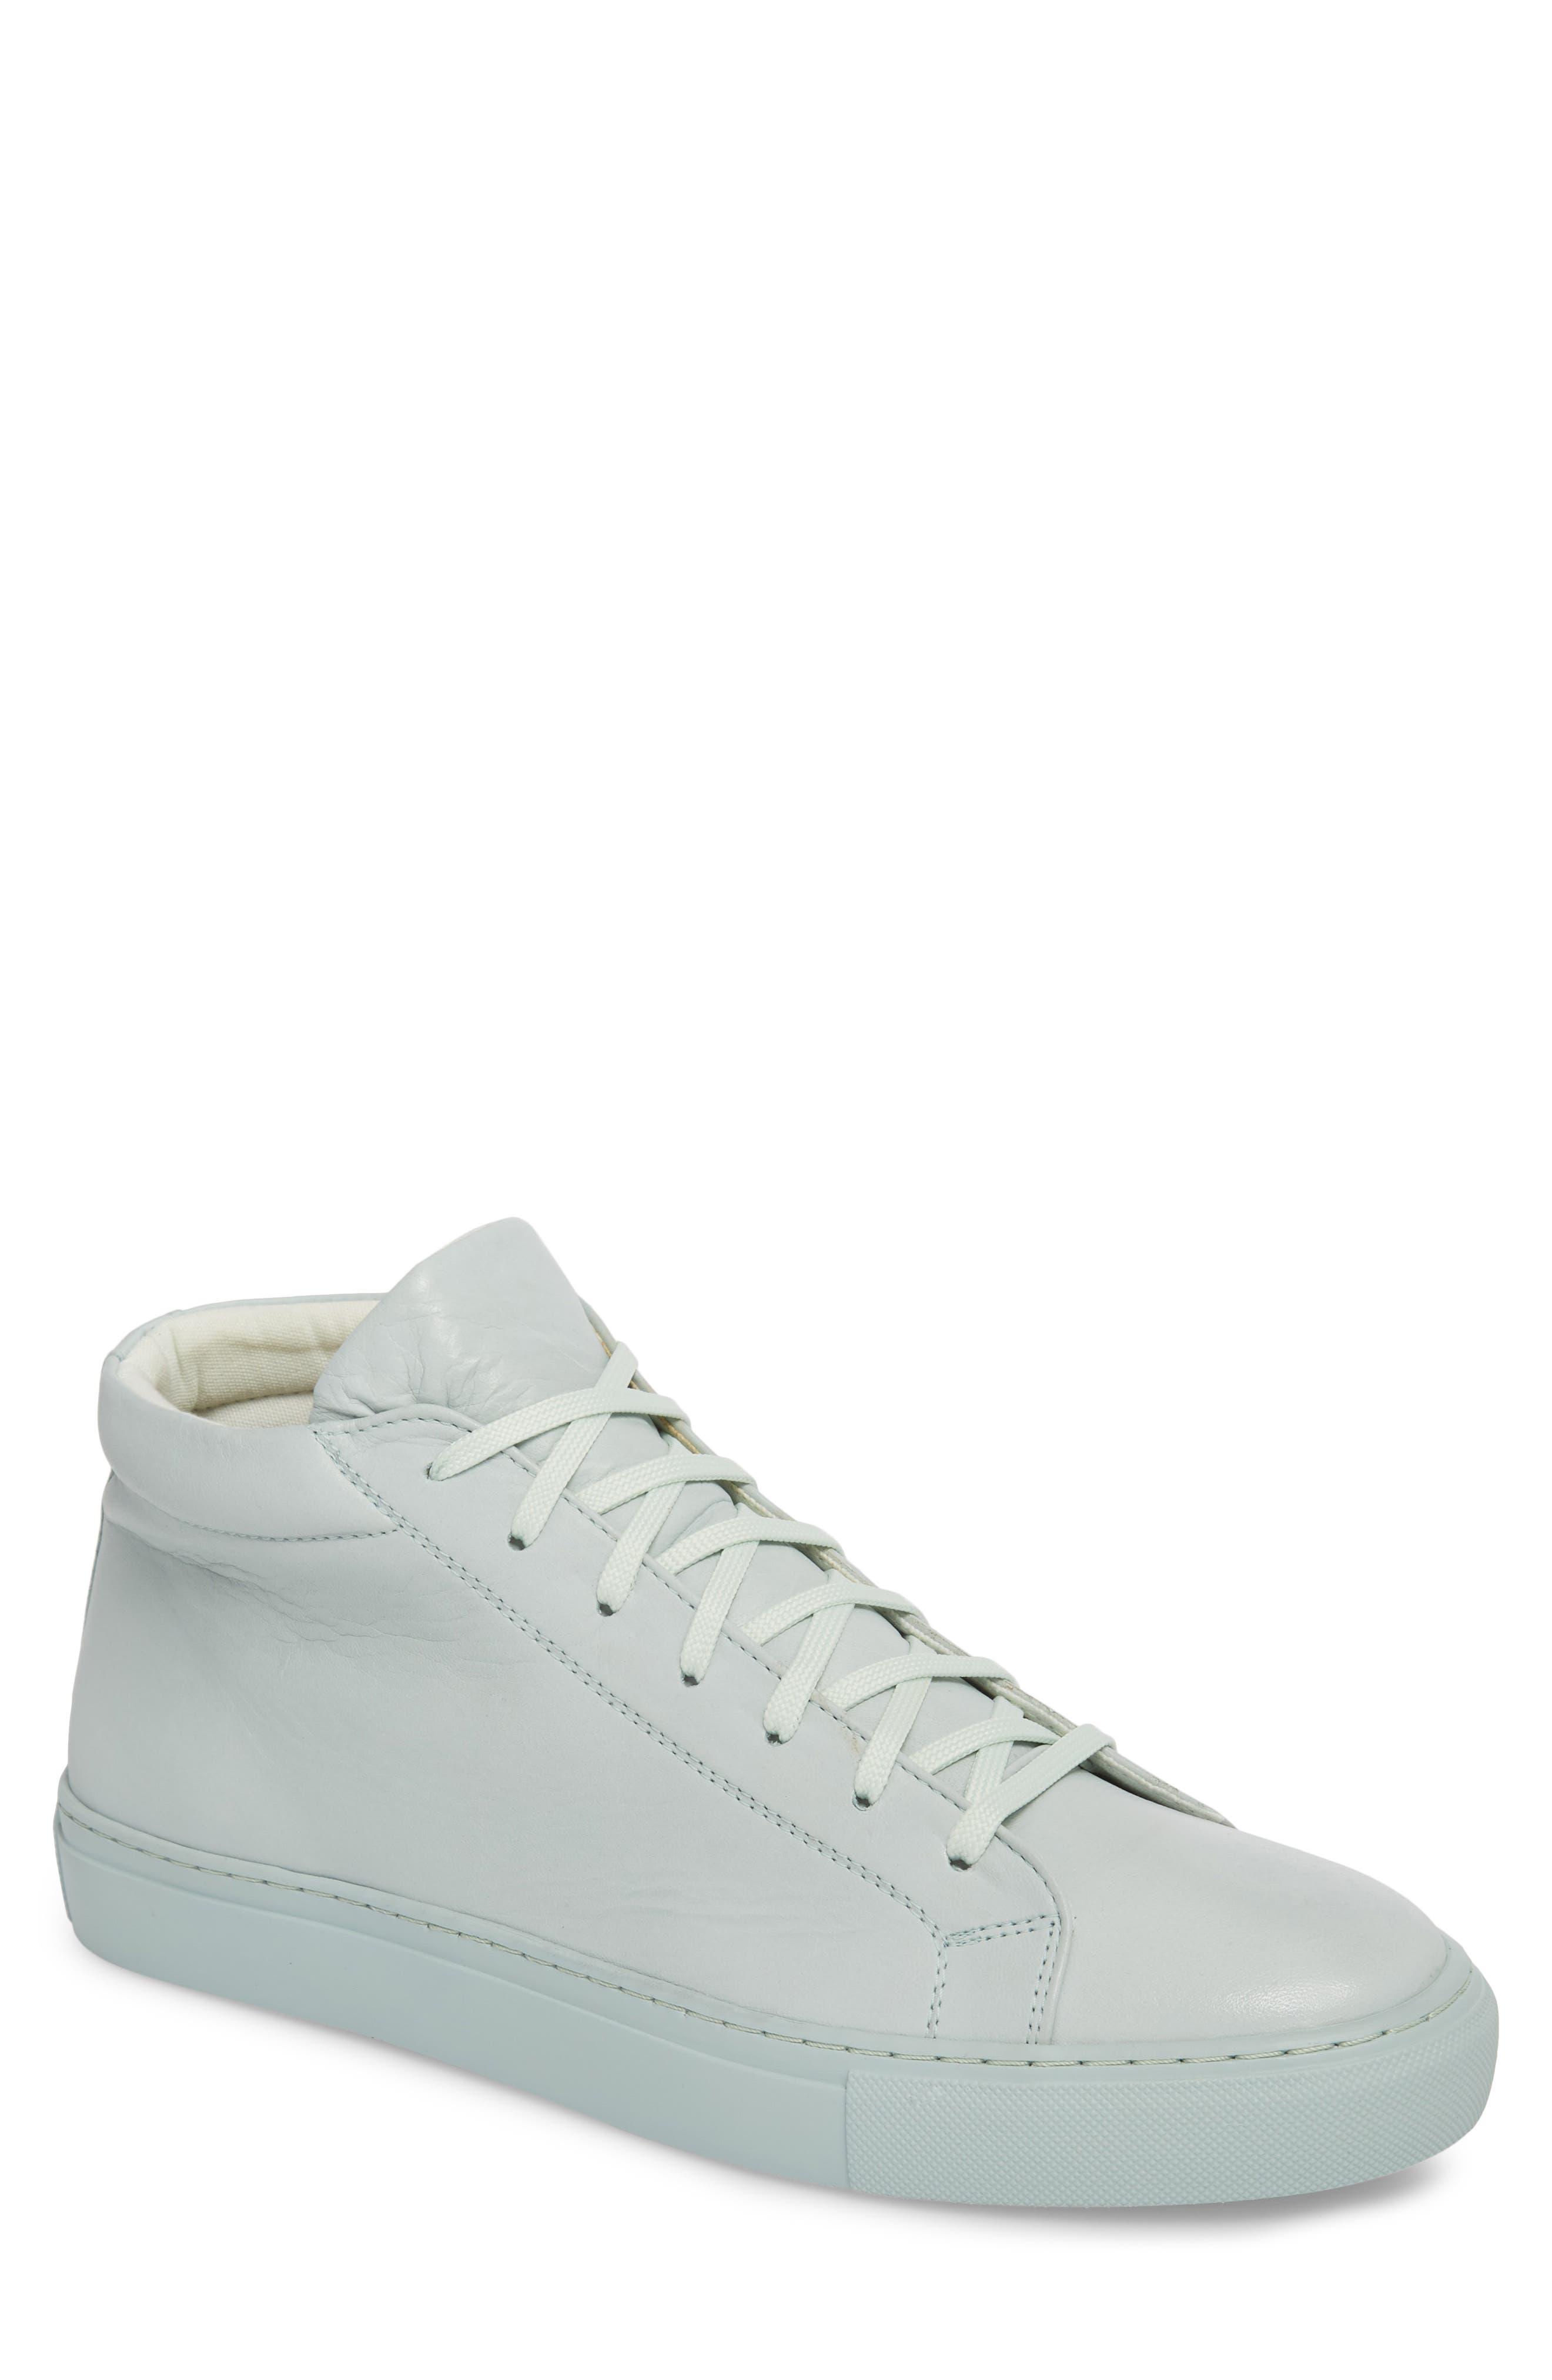 Lexington Mid Top Sneaker,                         Main,                         color, 303